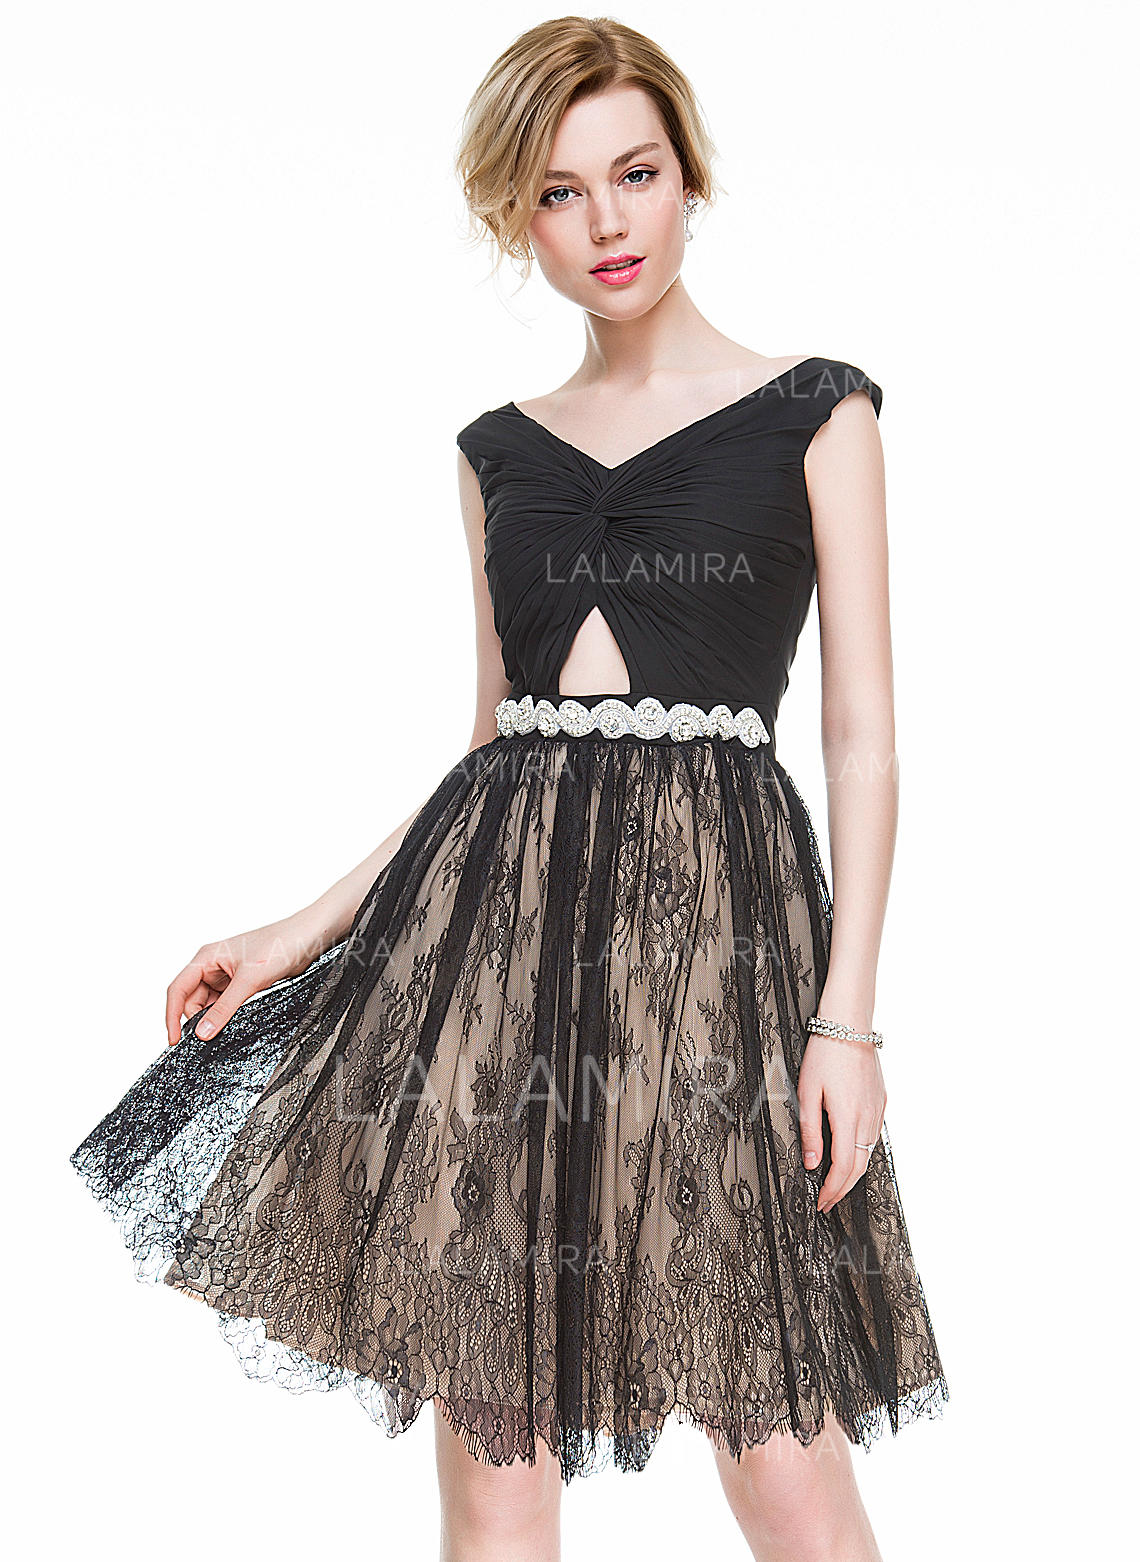 37658311b1634 Magnificent A-Line/Princess V-neck General Plus Chiffon Lace Cocktail  Dresses (. Loading zoom